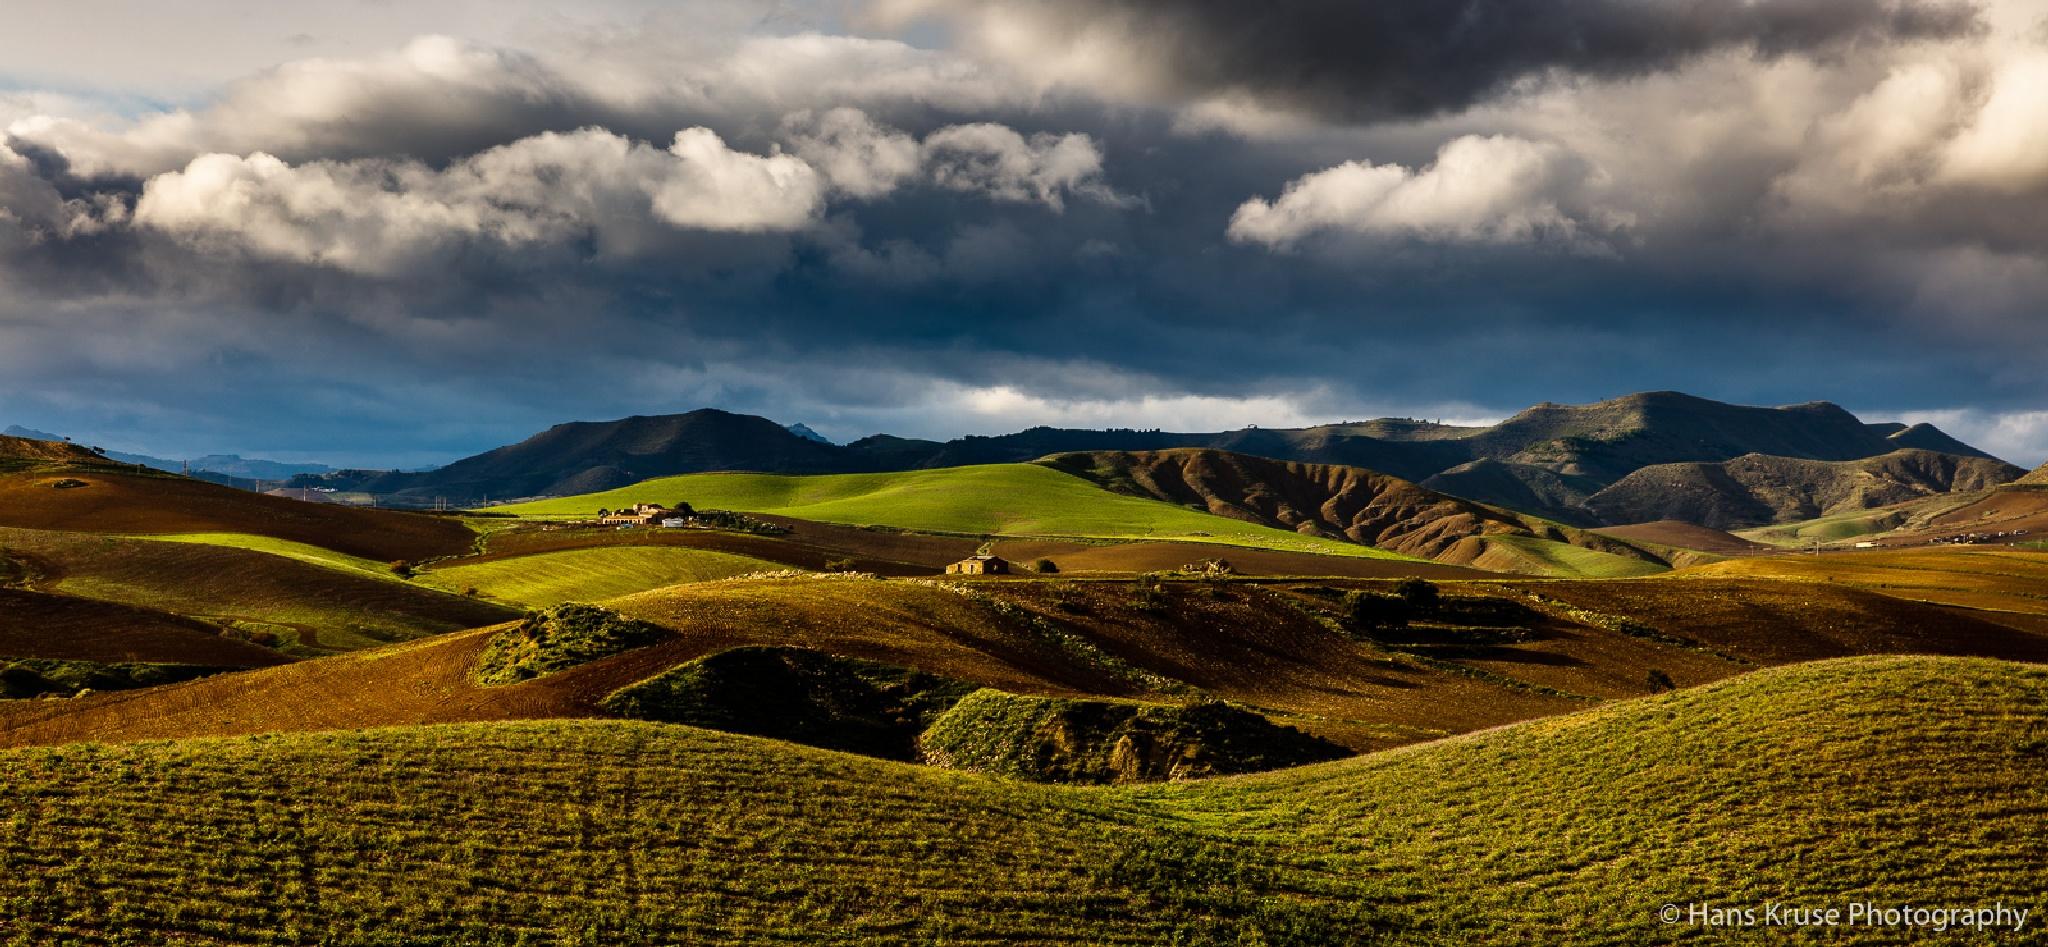 Rural Sicilian landscape by Hans Kruse